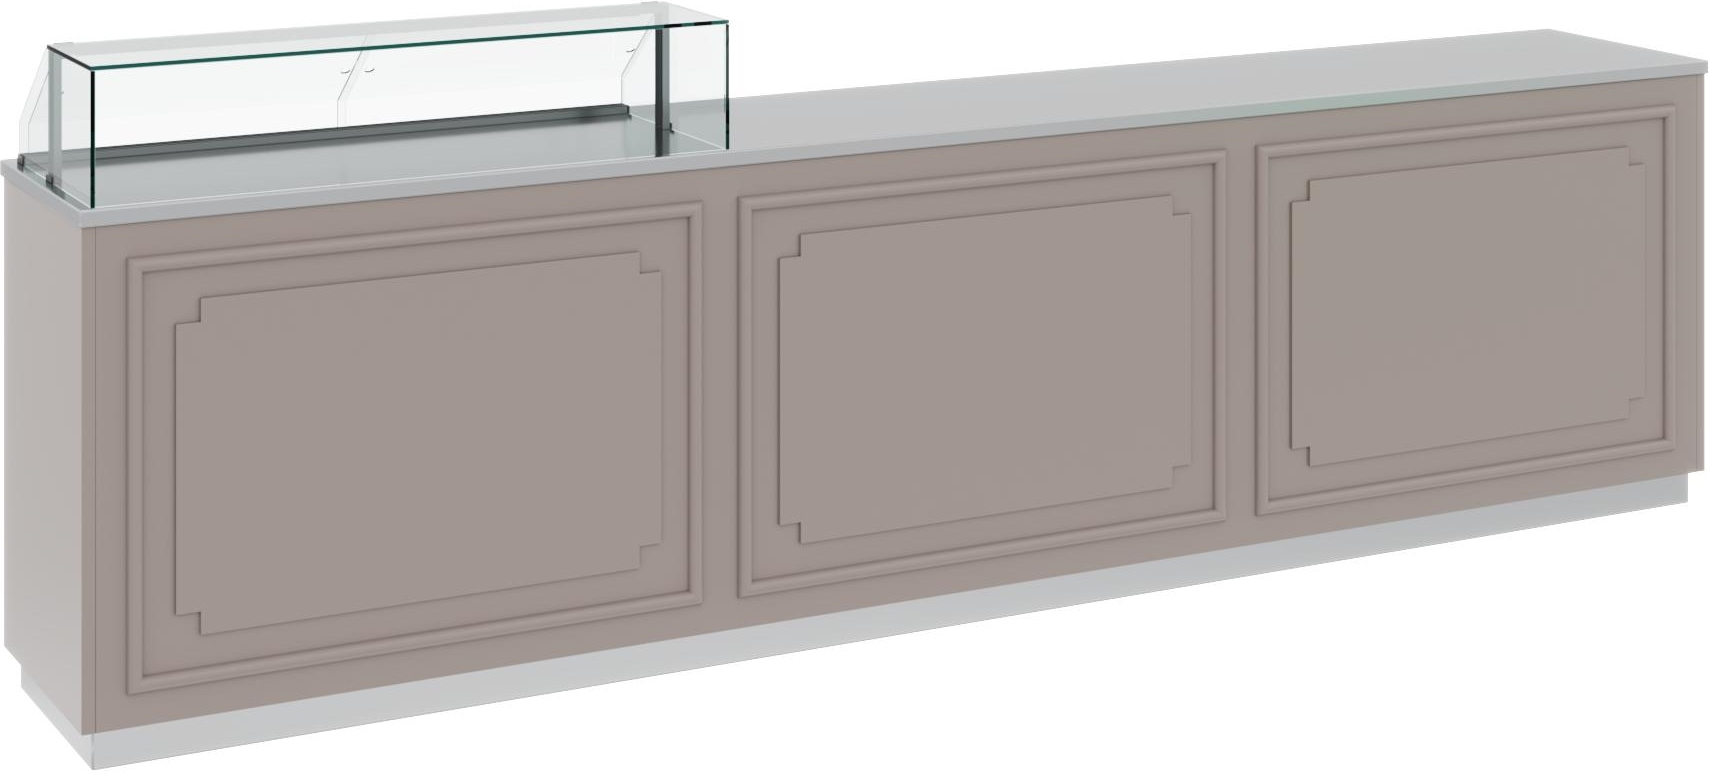 Нейтральная витрина CARBOMA OMI AC40N 1.75-1 - 1